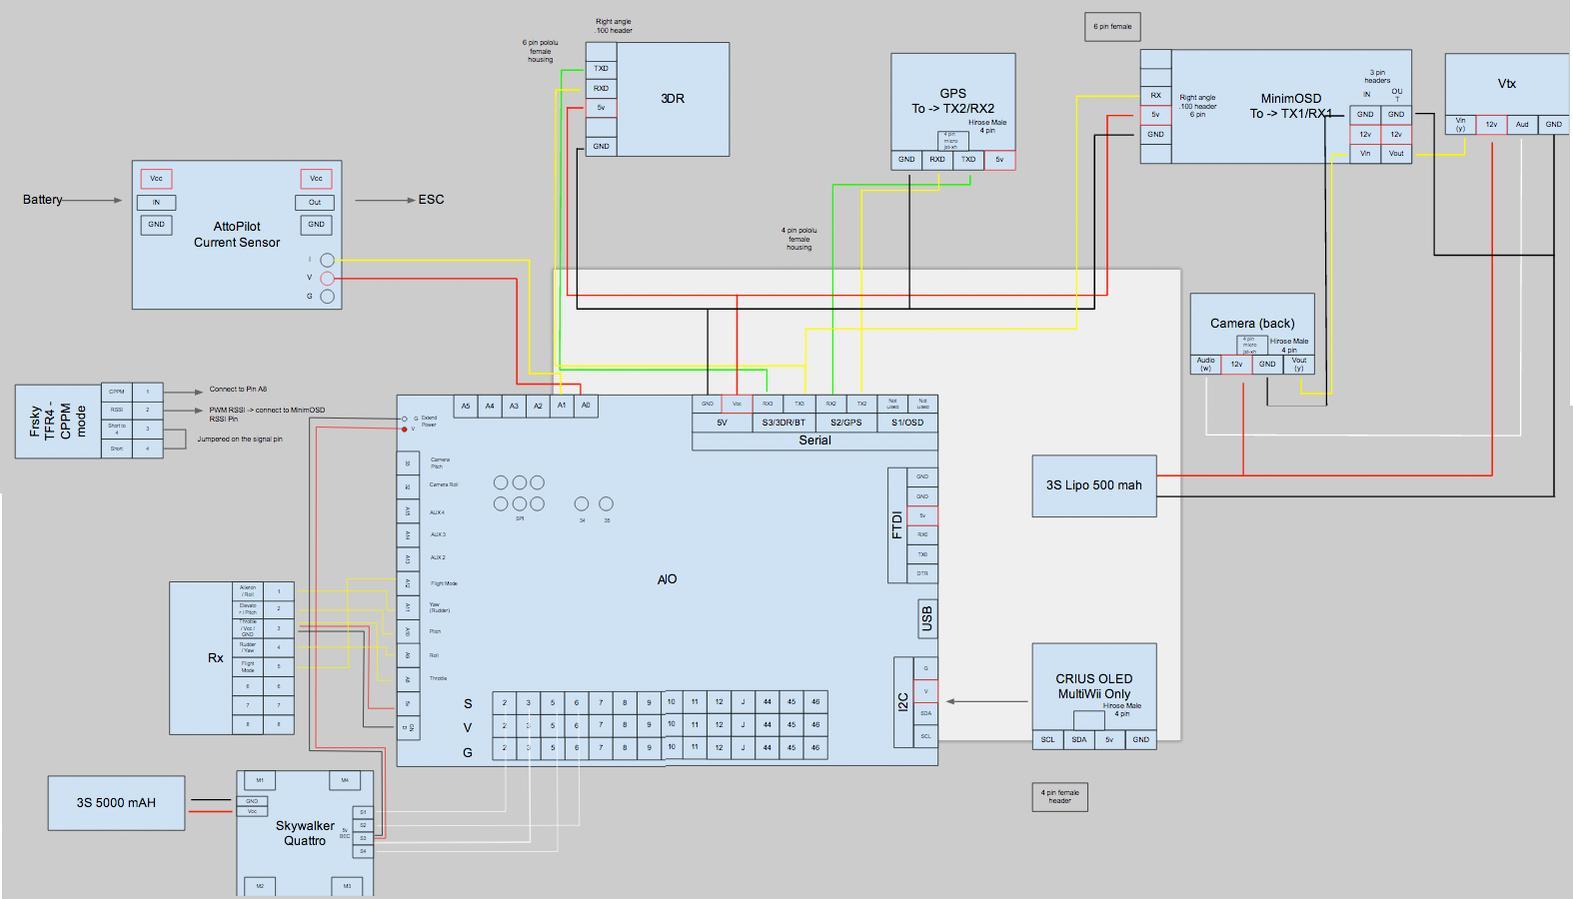 fpv wiring diagram headlight relay mod attachment browser: crius-wiring-diagram---v2.jpg by mochaboy - rc groups